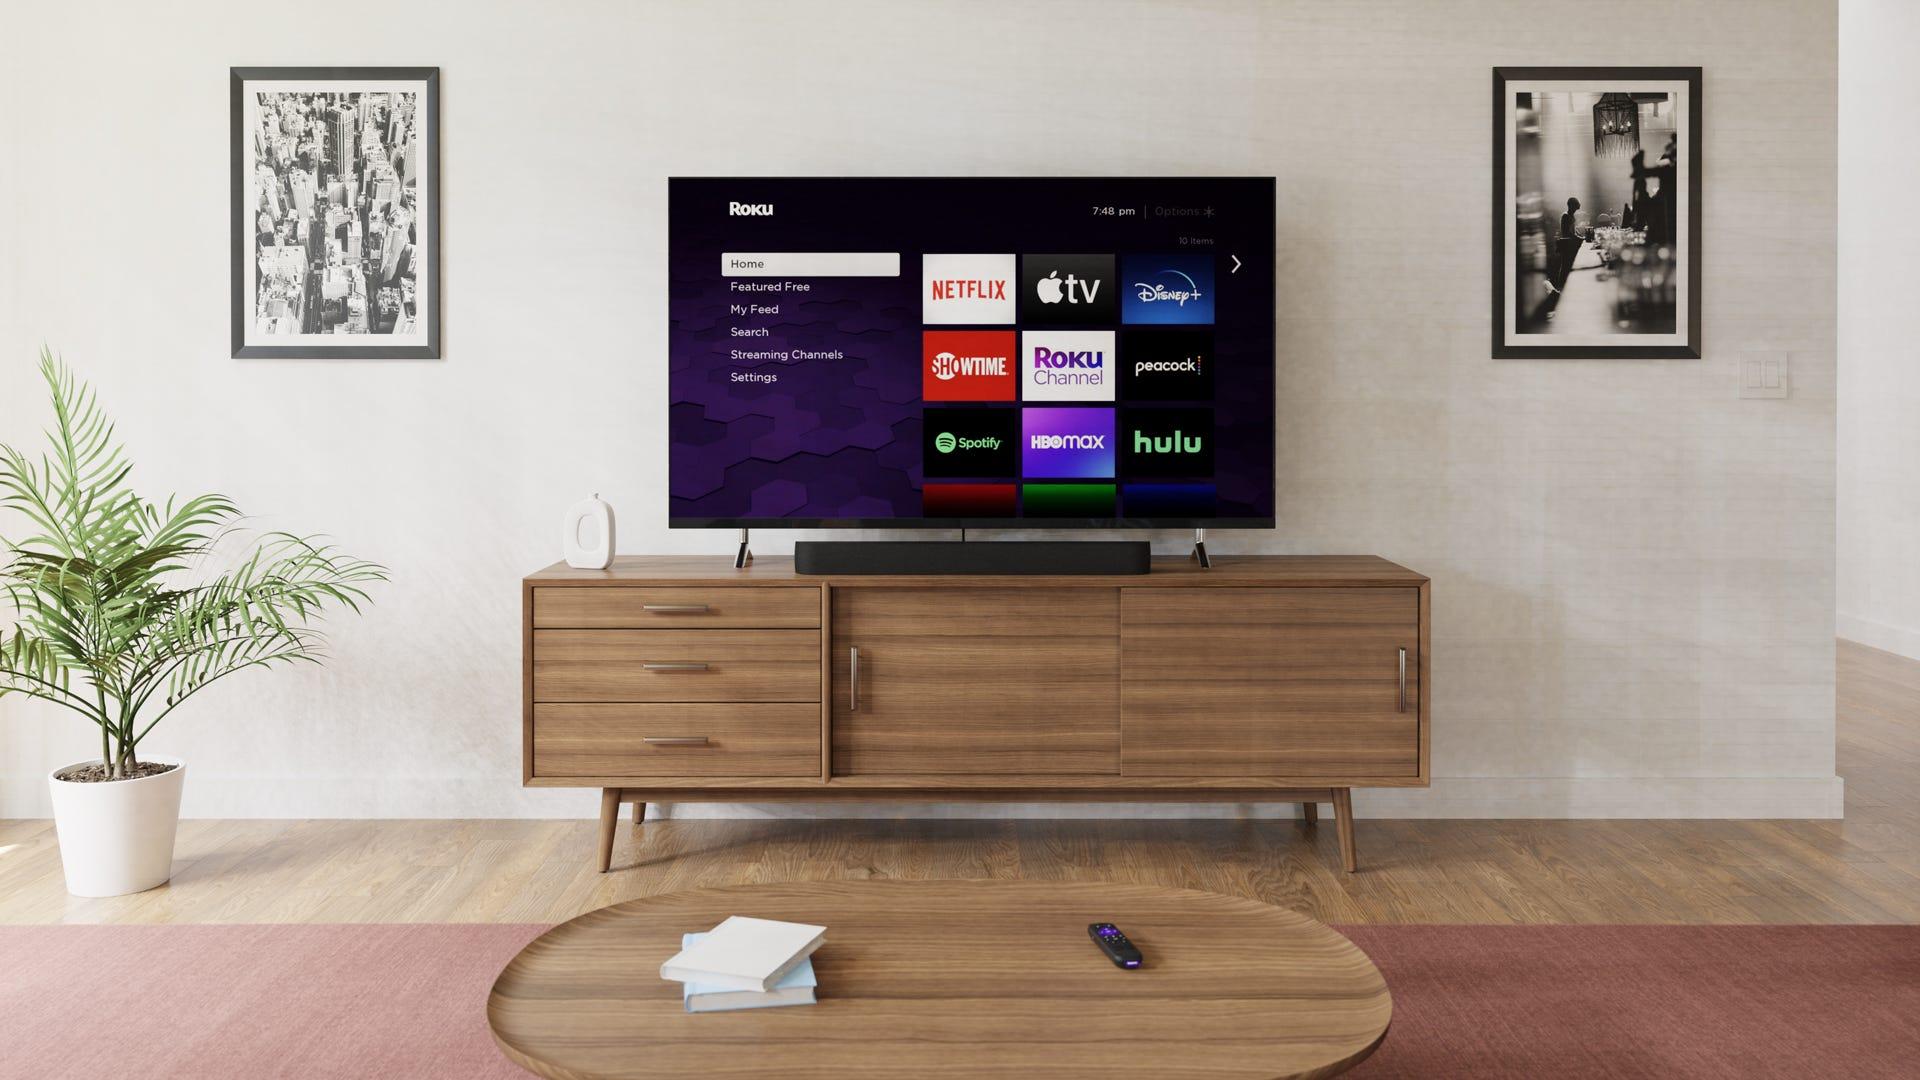 Roku Streambar Pro next to a TV